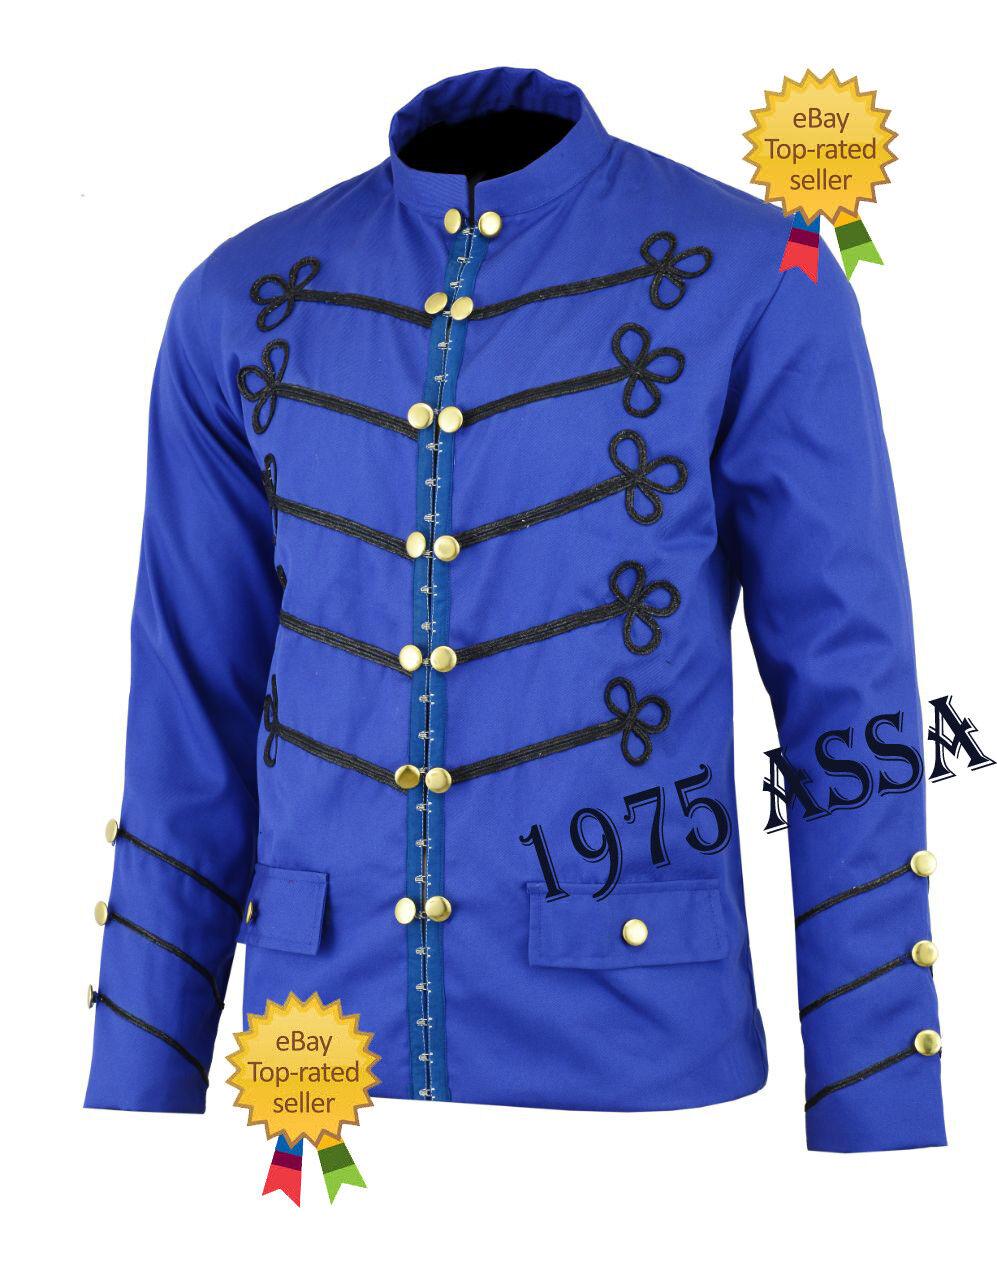 Uomo-handmade-BLU-Ricamo Uomo-handmade-BLU-Ricamo Uomo-handmade-BLU-Ricamo - MILITARI-NAPOLEONE-Hook-Giacca - 100-Cotone 843b5d